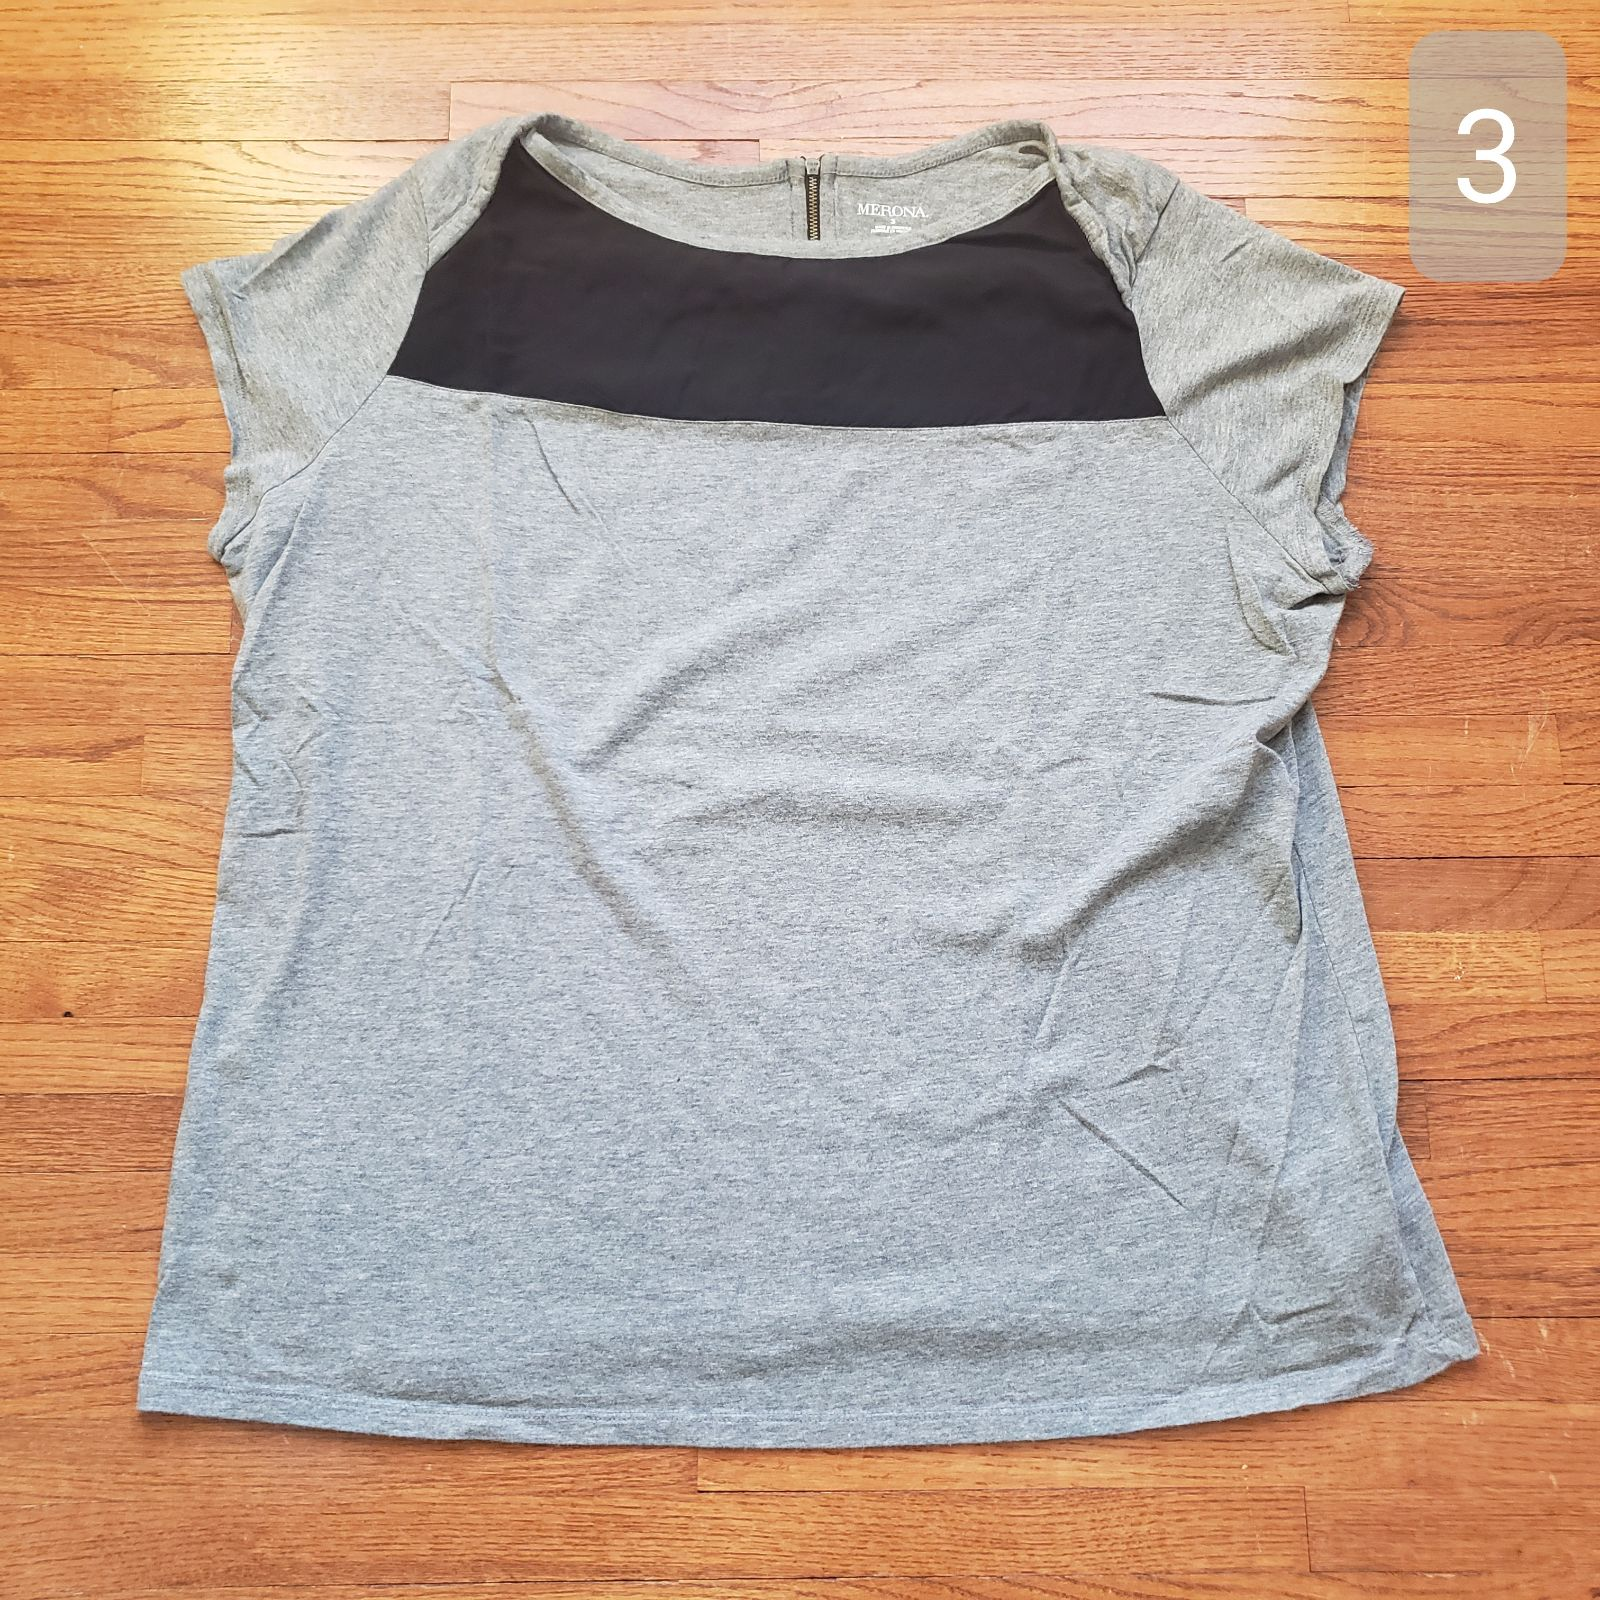 Merona   S/S Colorblock Top   Gray   3